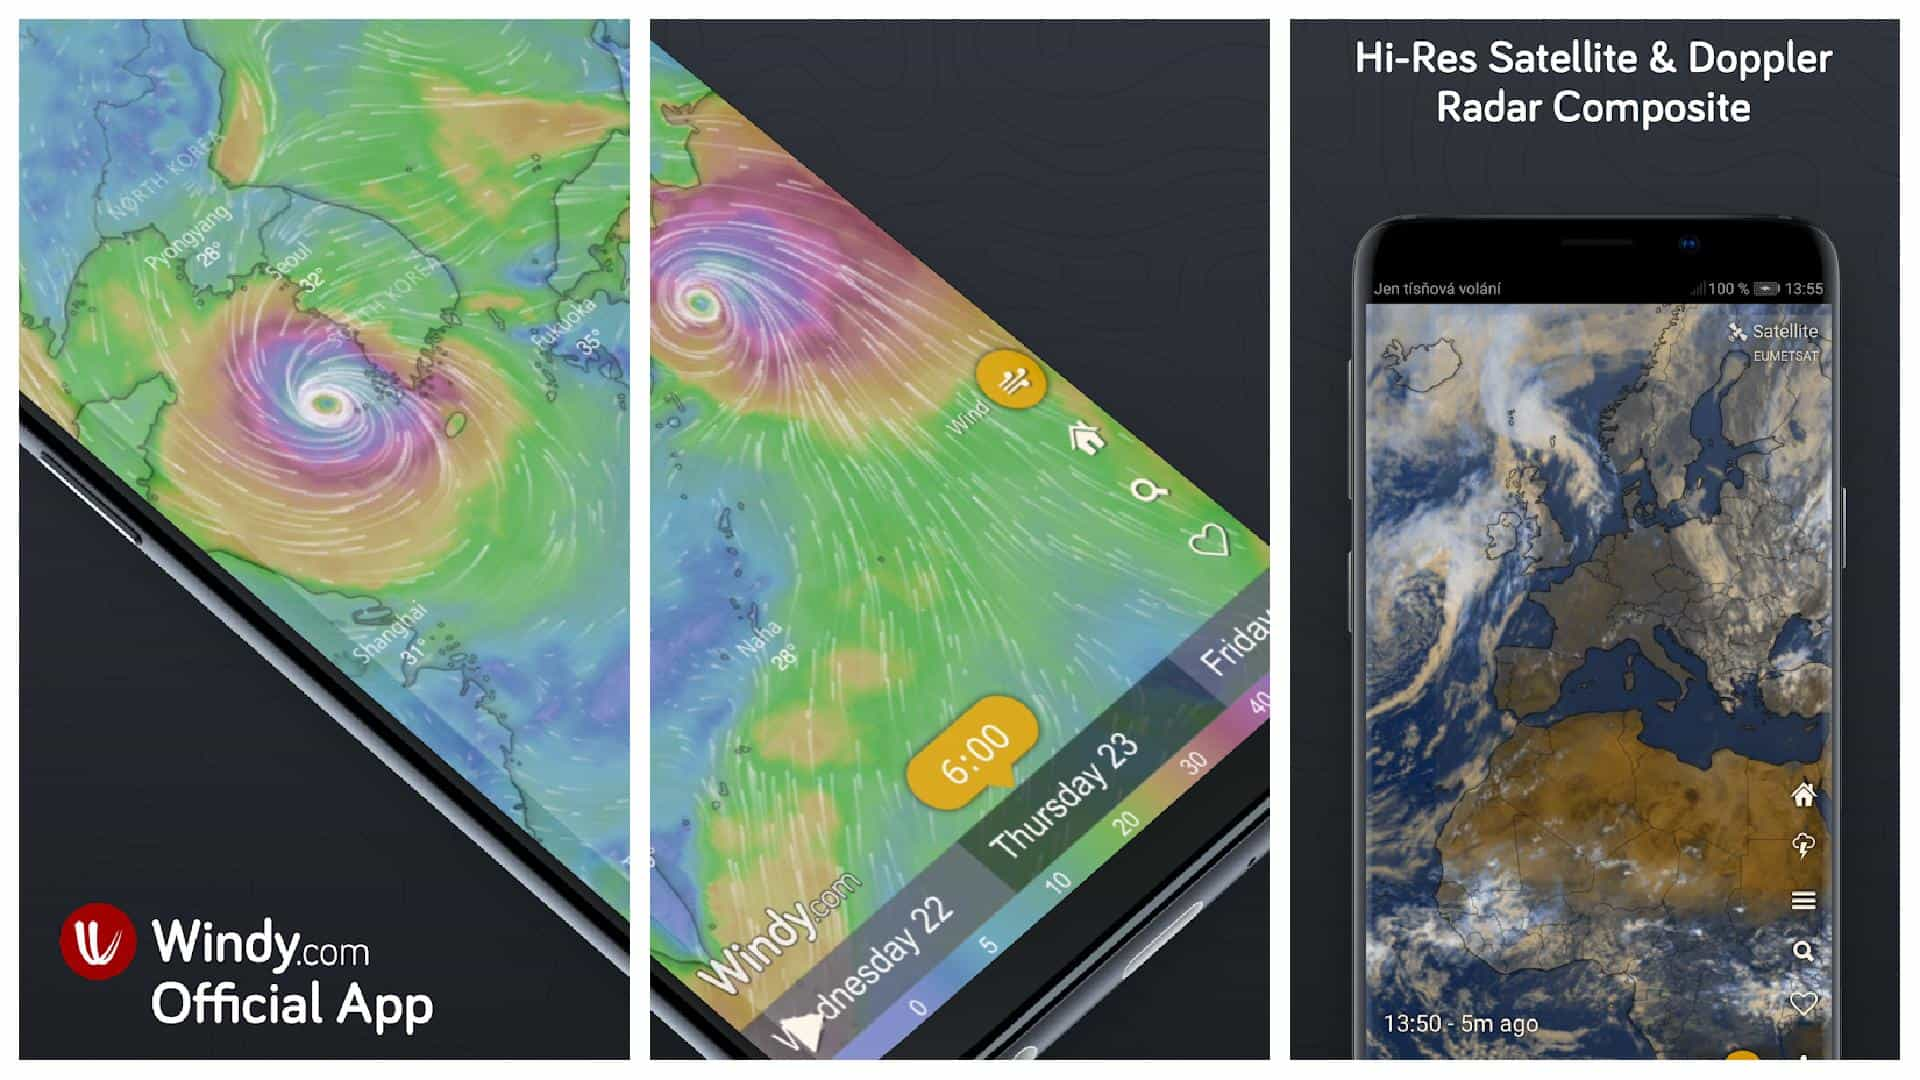 Windy com app grid image